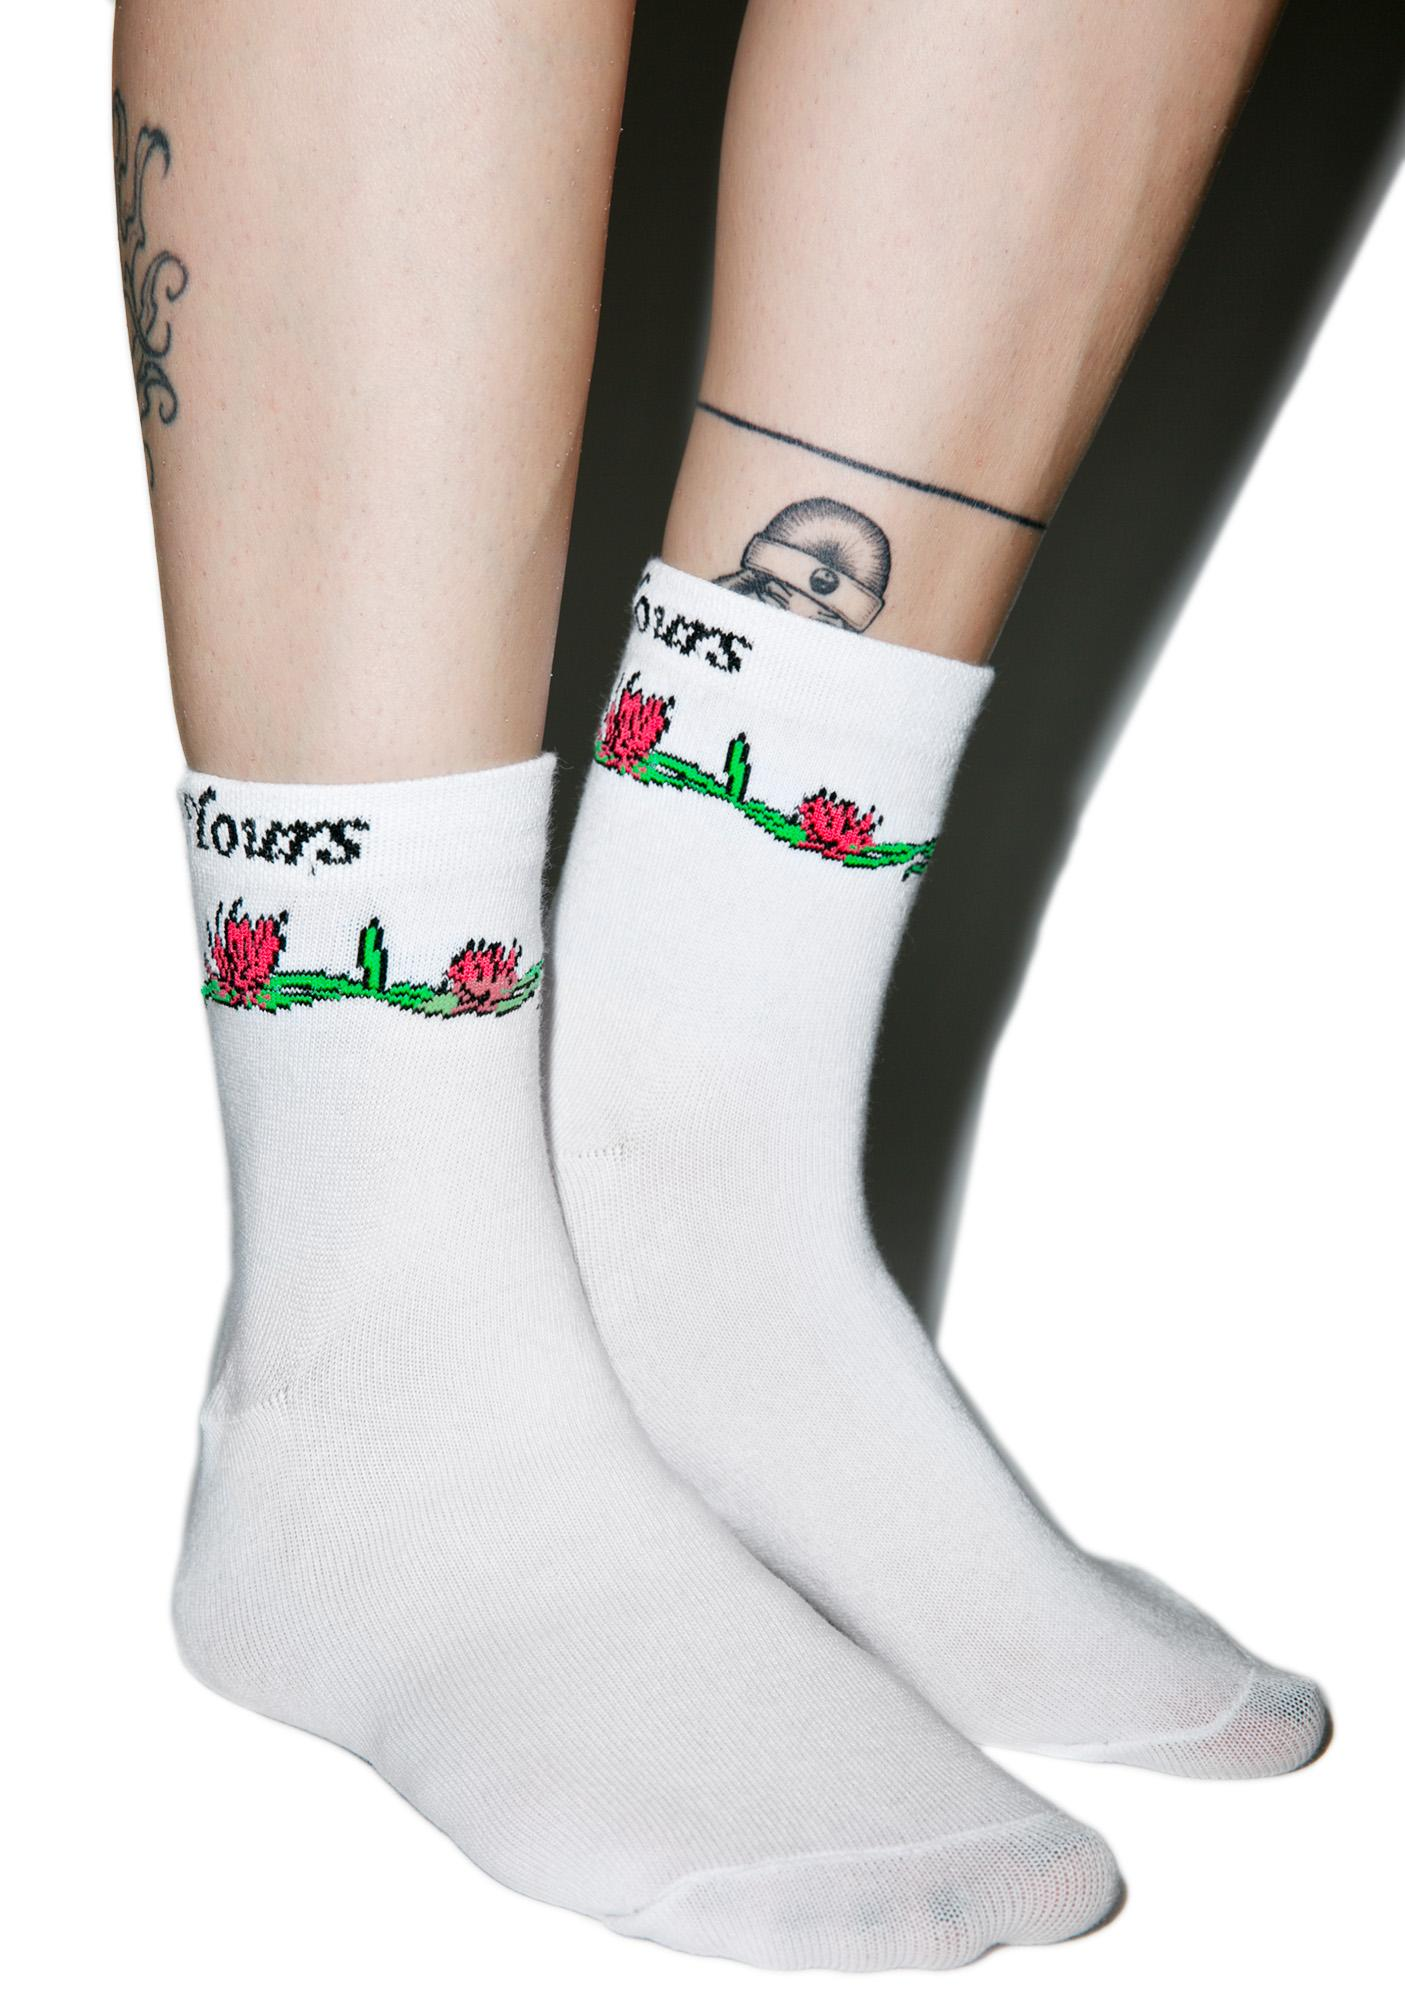 Not Yours Socks